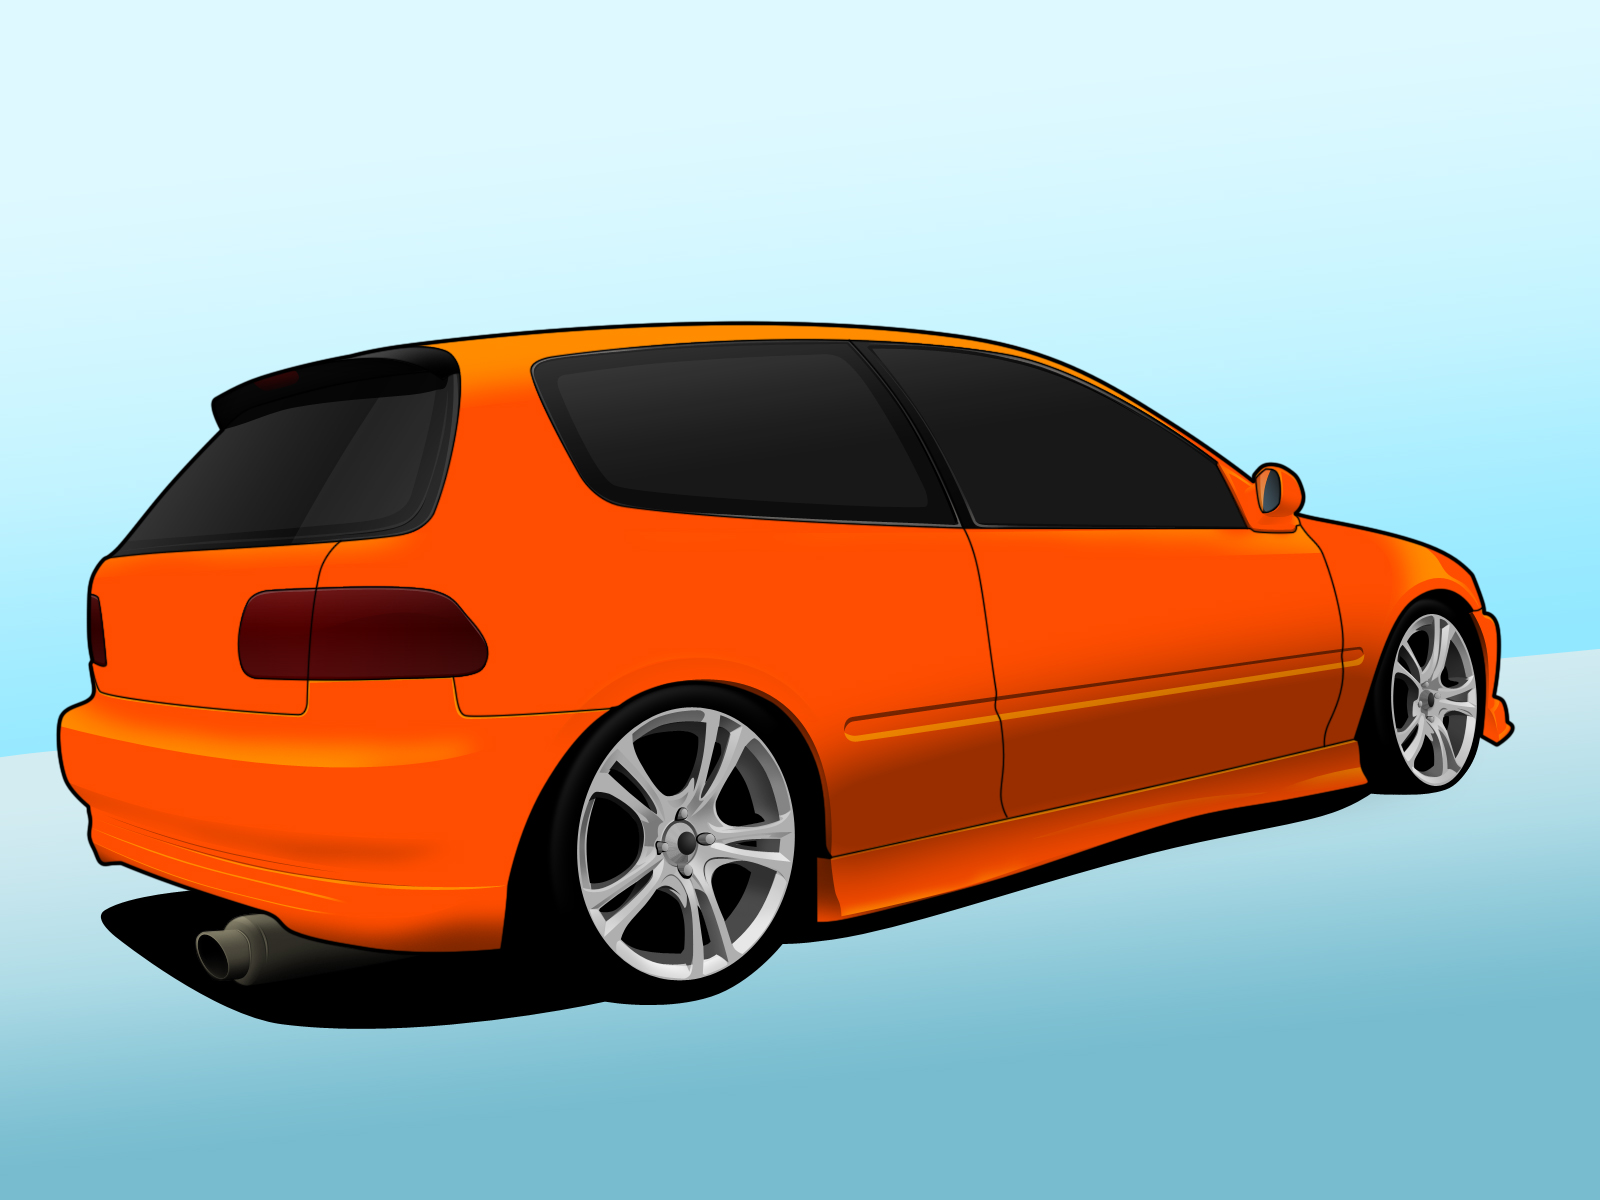 Honda civic vector by mrd2345 on deviantart for Honda owner login